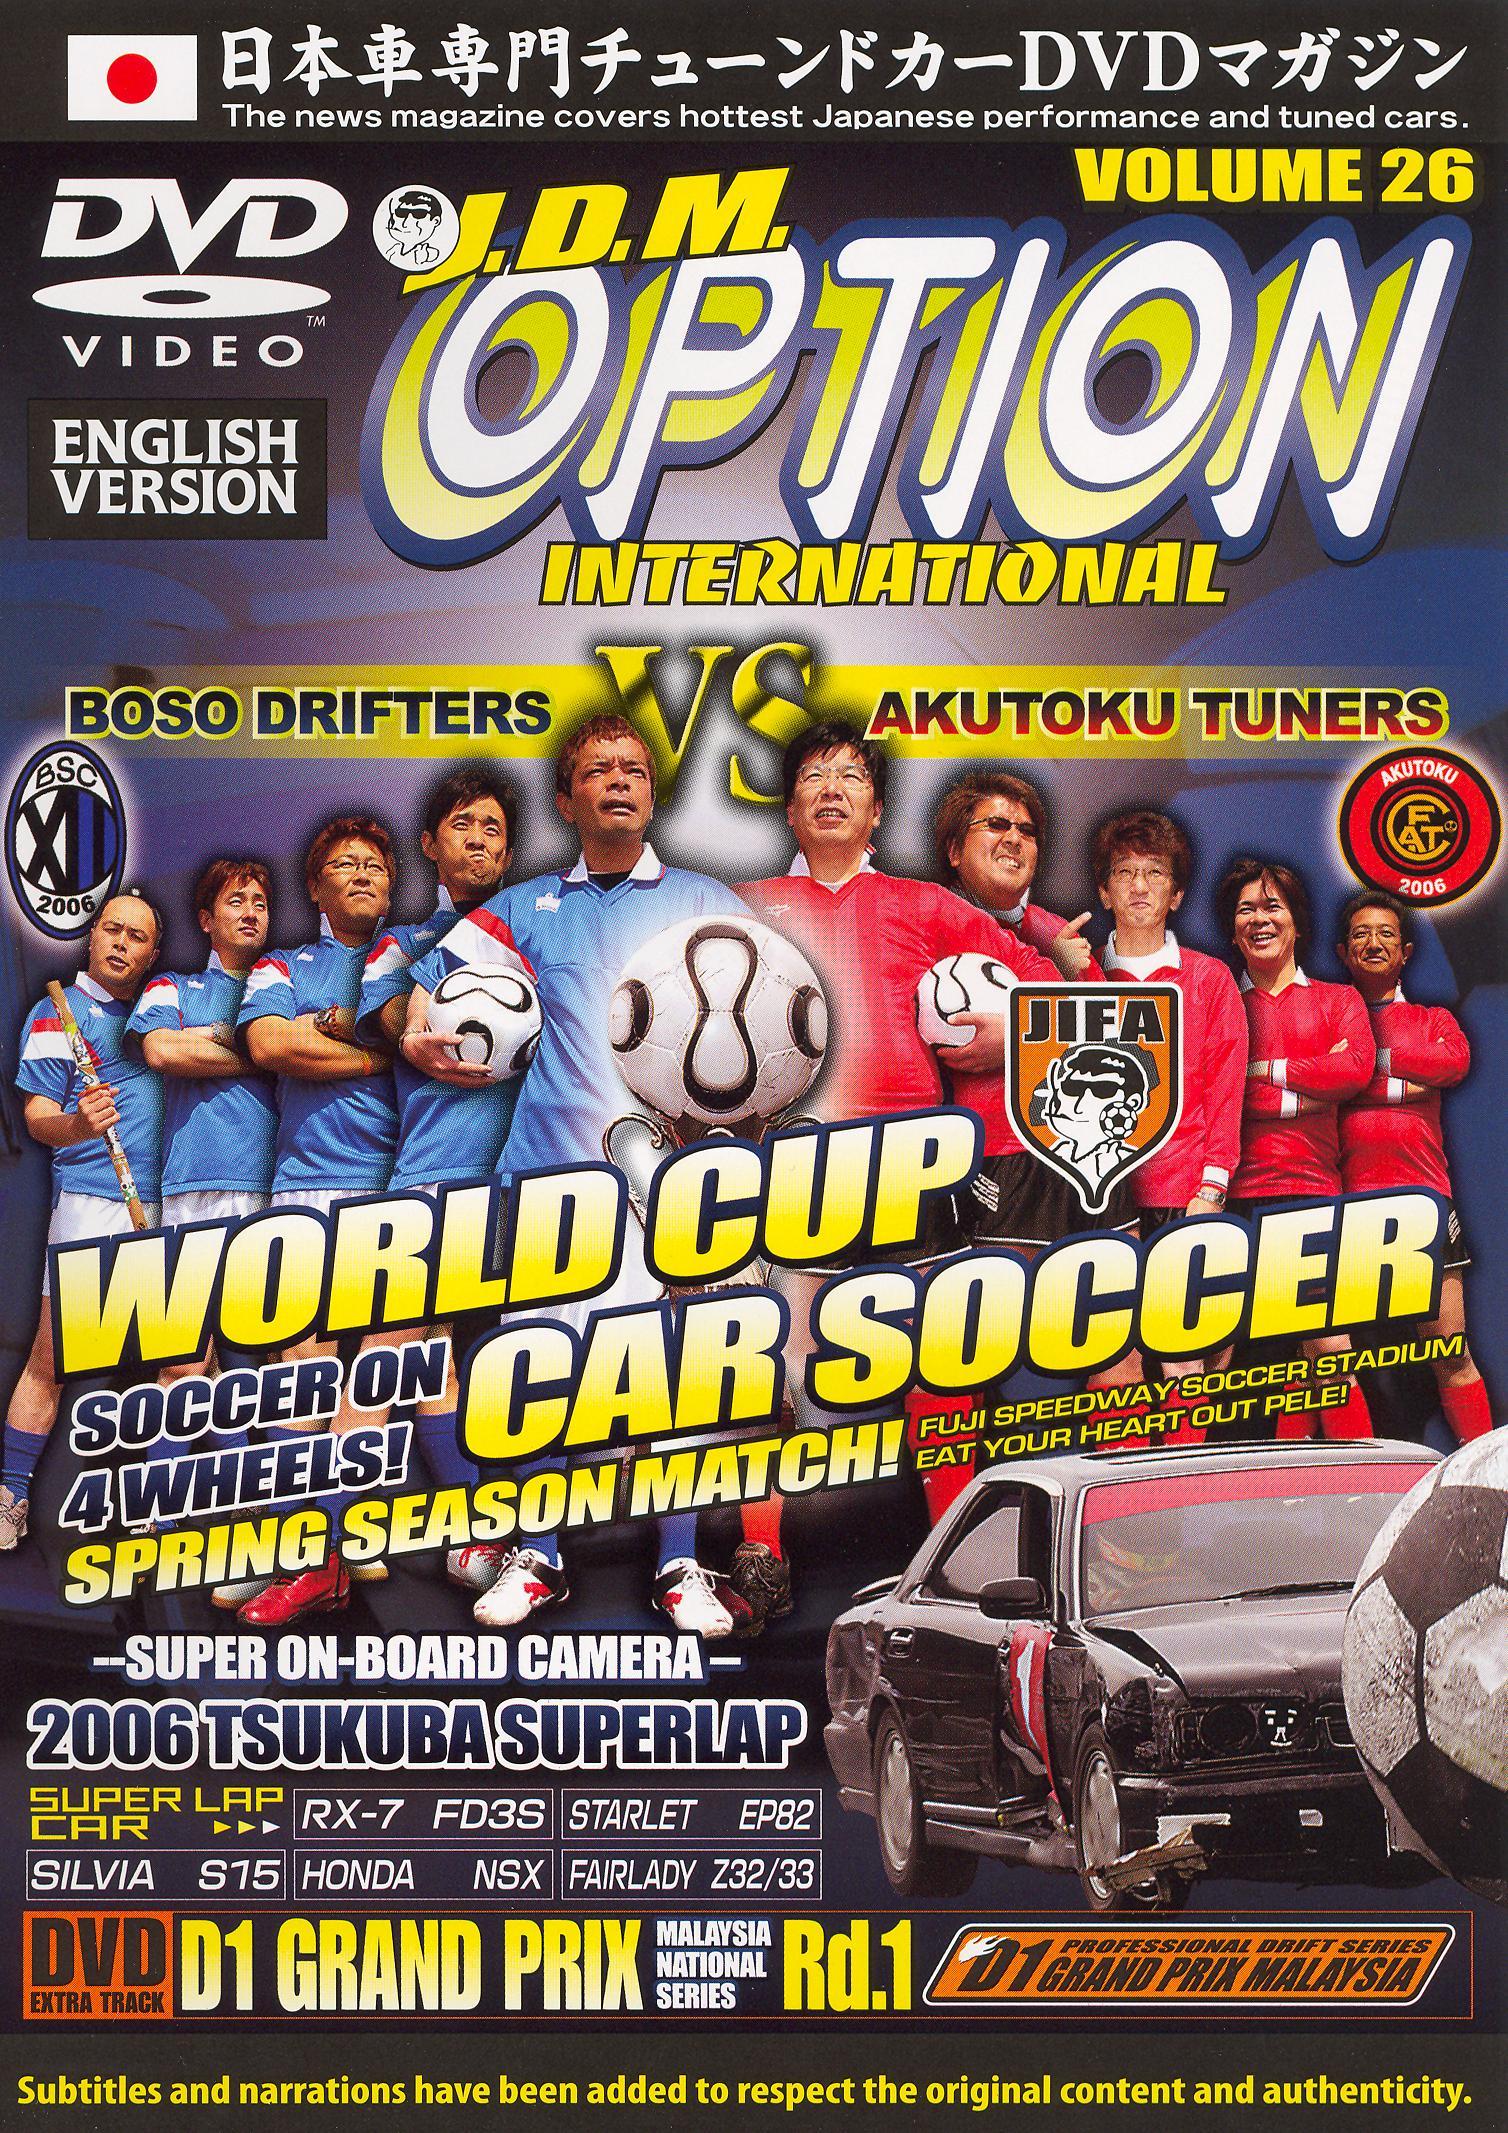 JDM Option, Vol. 26: World Cup Car Soccer!